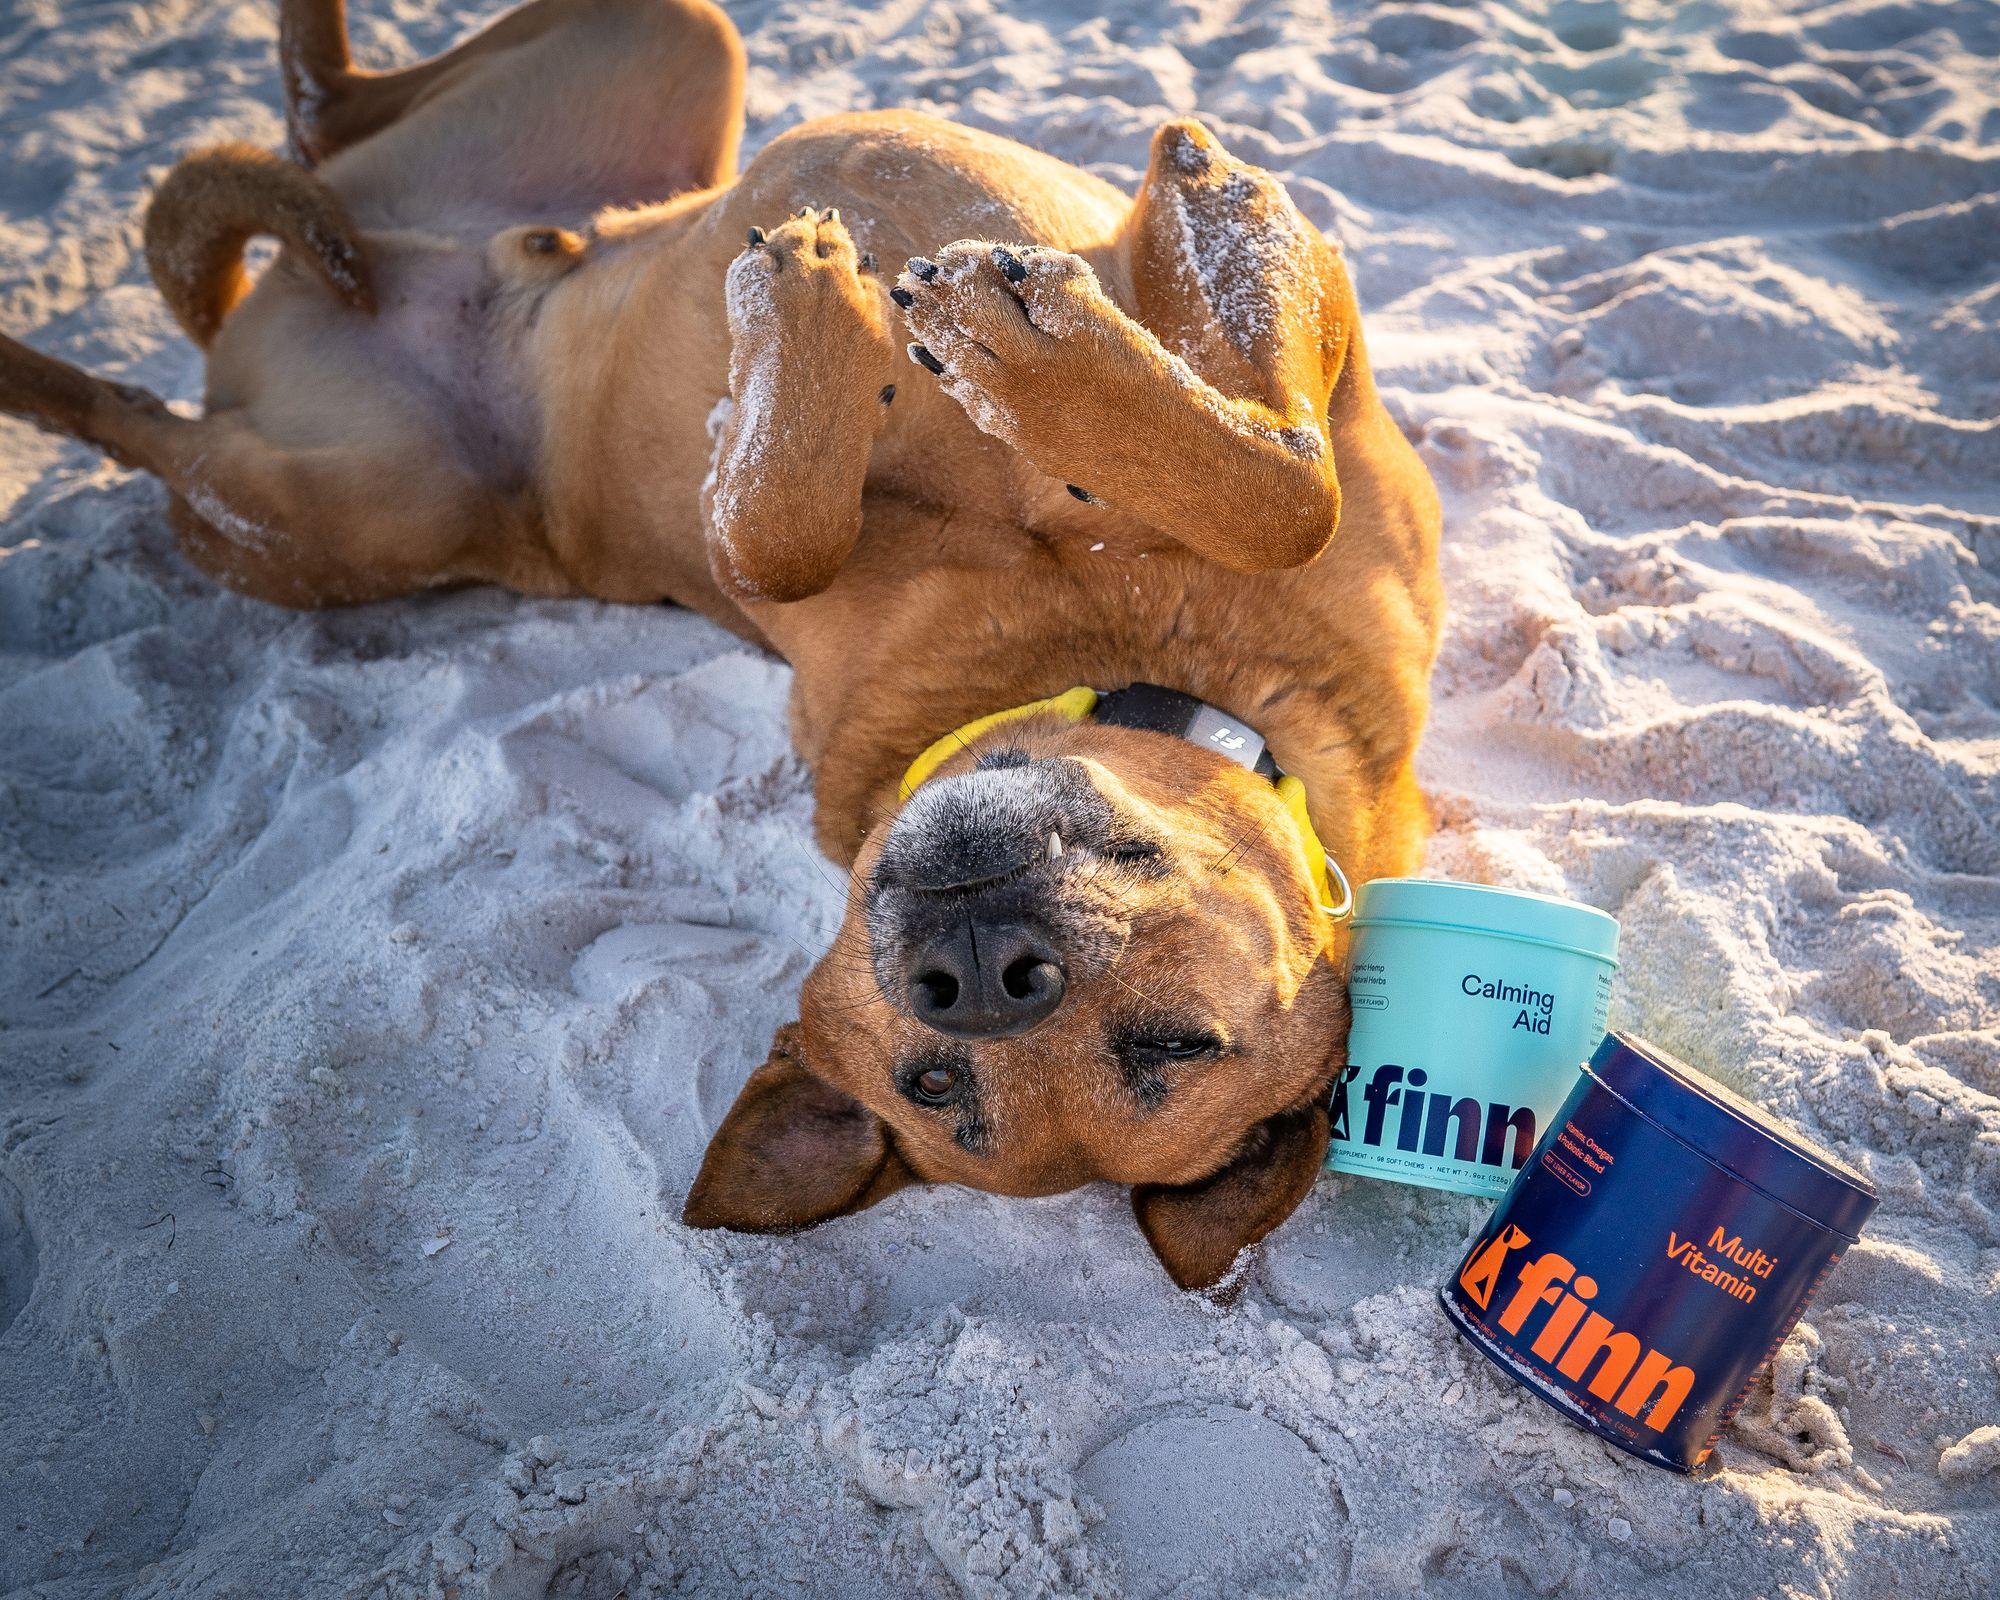 fi collar, dog with probiotics, probiotics for dogs